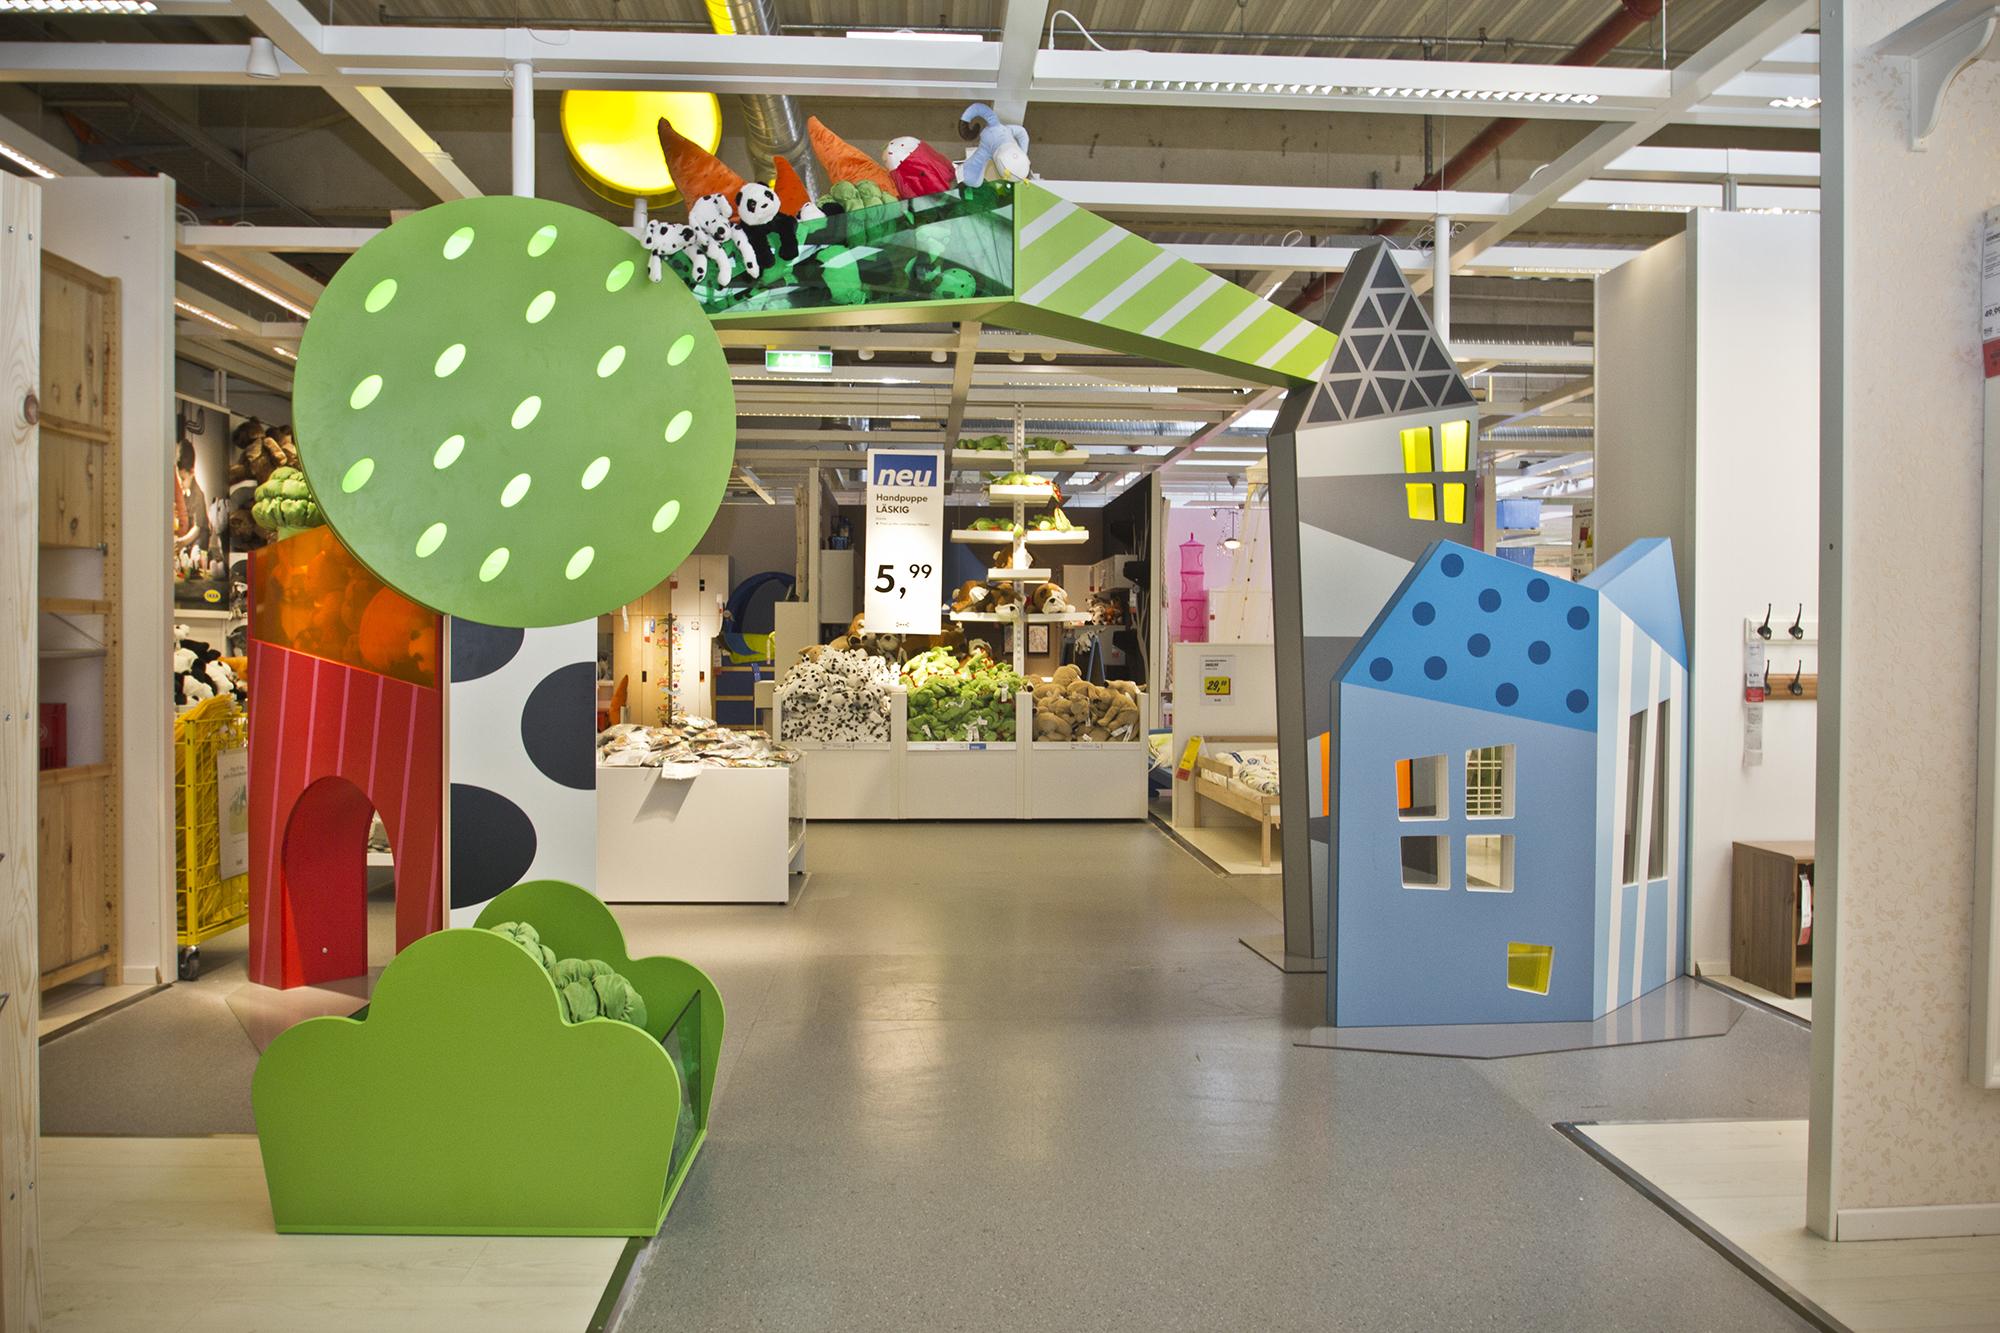 Childrens_IKEA_entrance_2.jpg